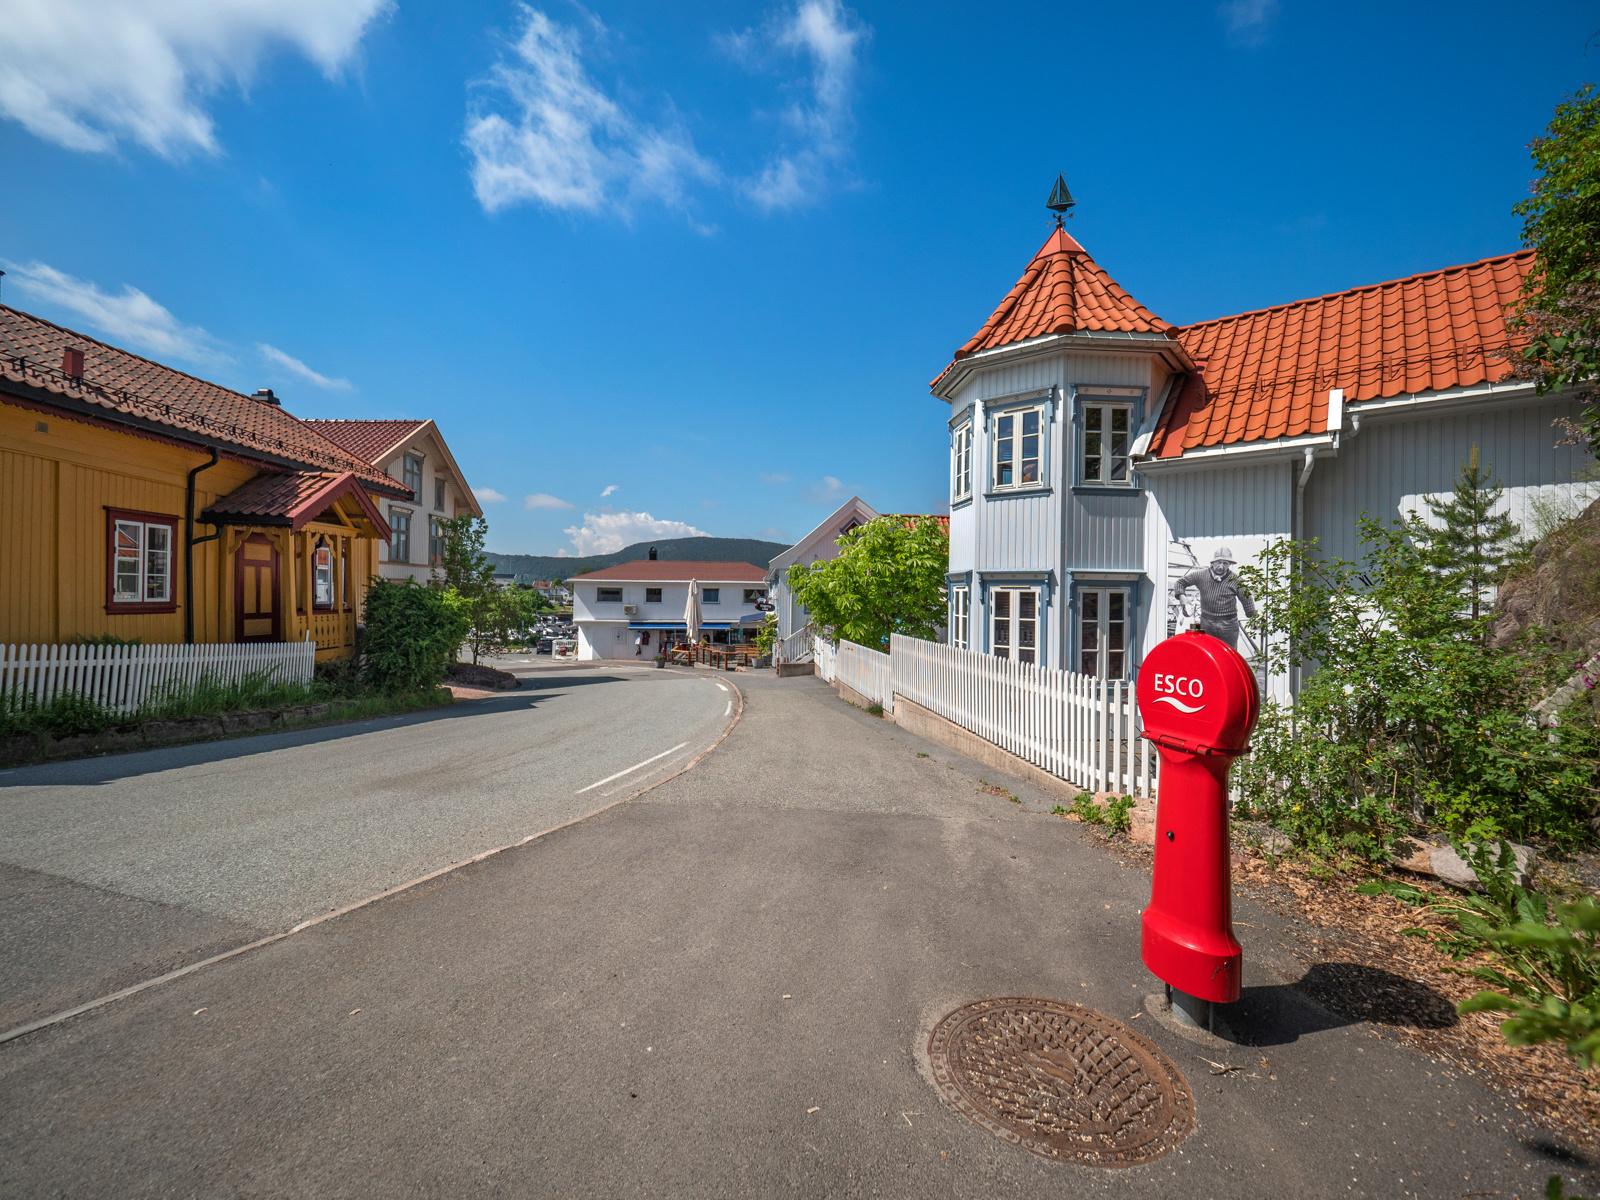 Fra hytta er det en hyggelig gåtur til sjarmerende Holmsbu sentrum